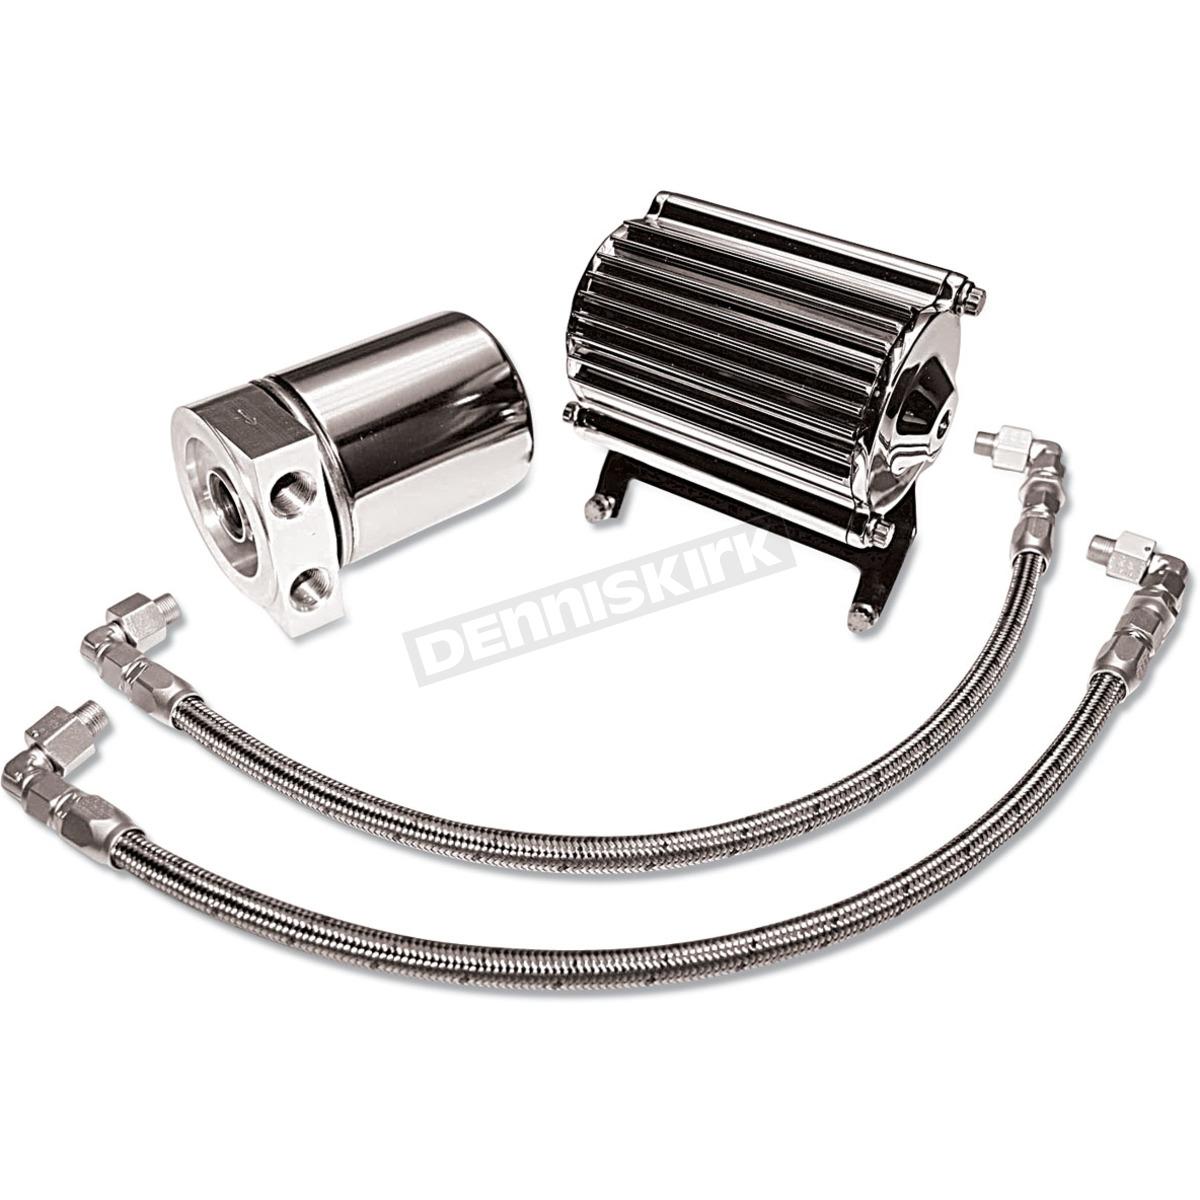 Feuling Motor Oil Pump Corporation Chrome Oil Cooler Kit